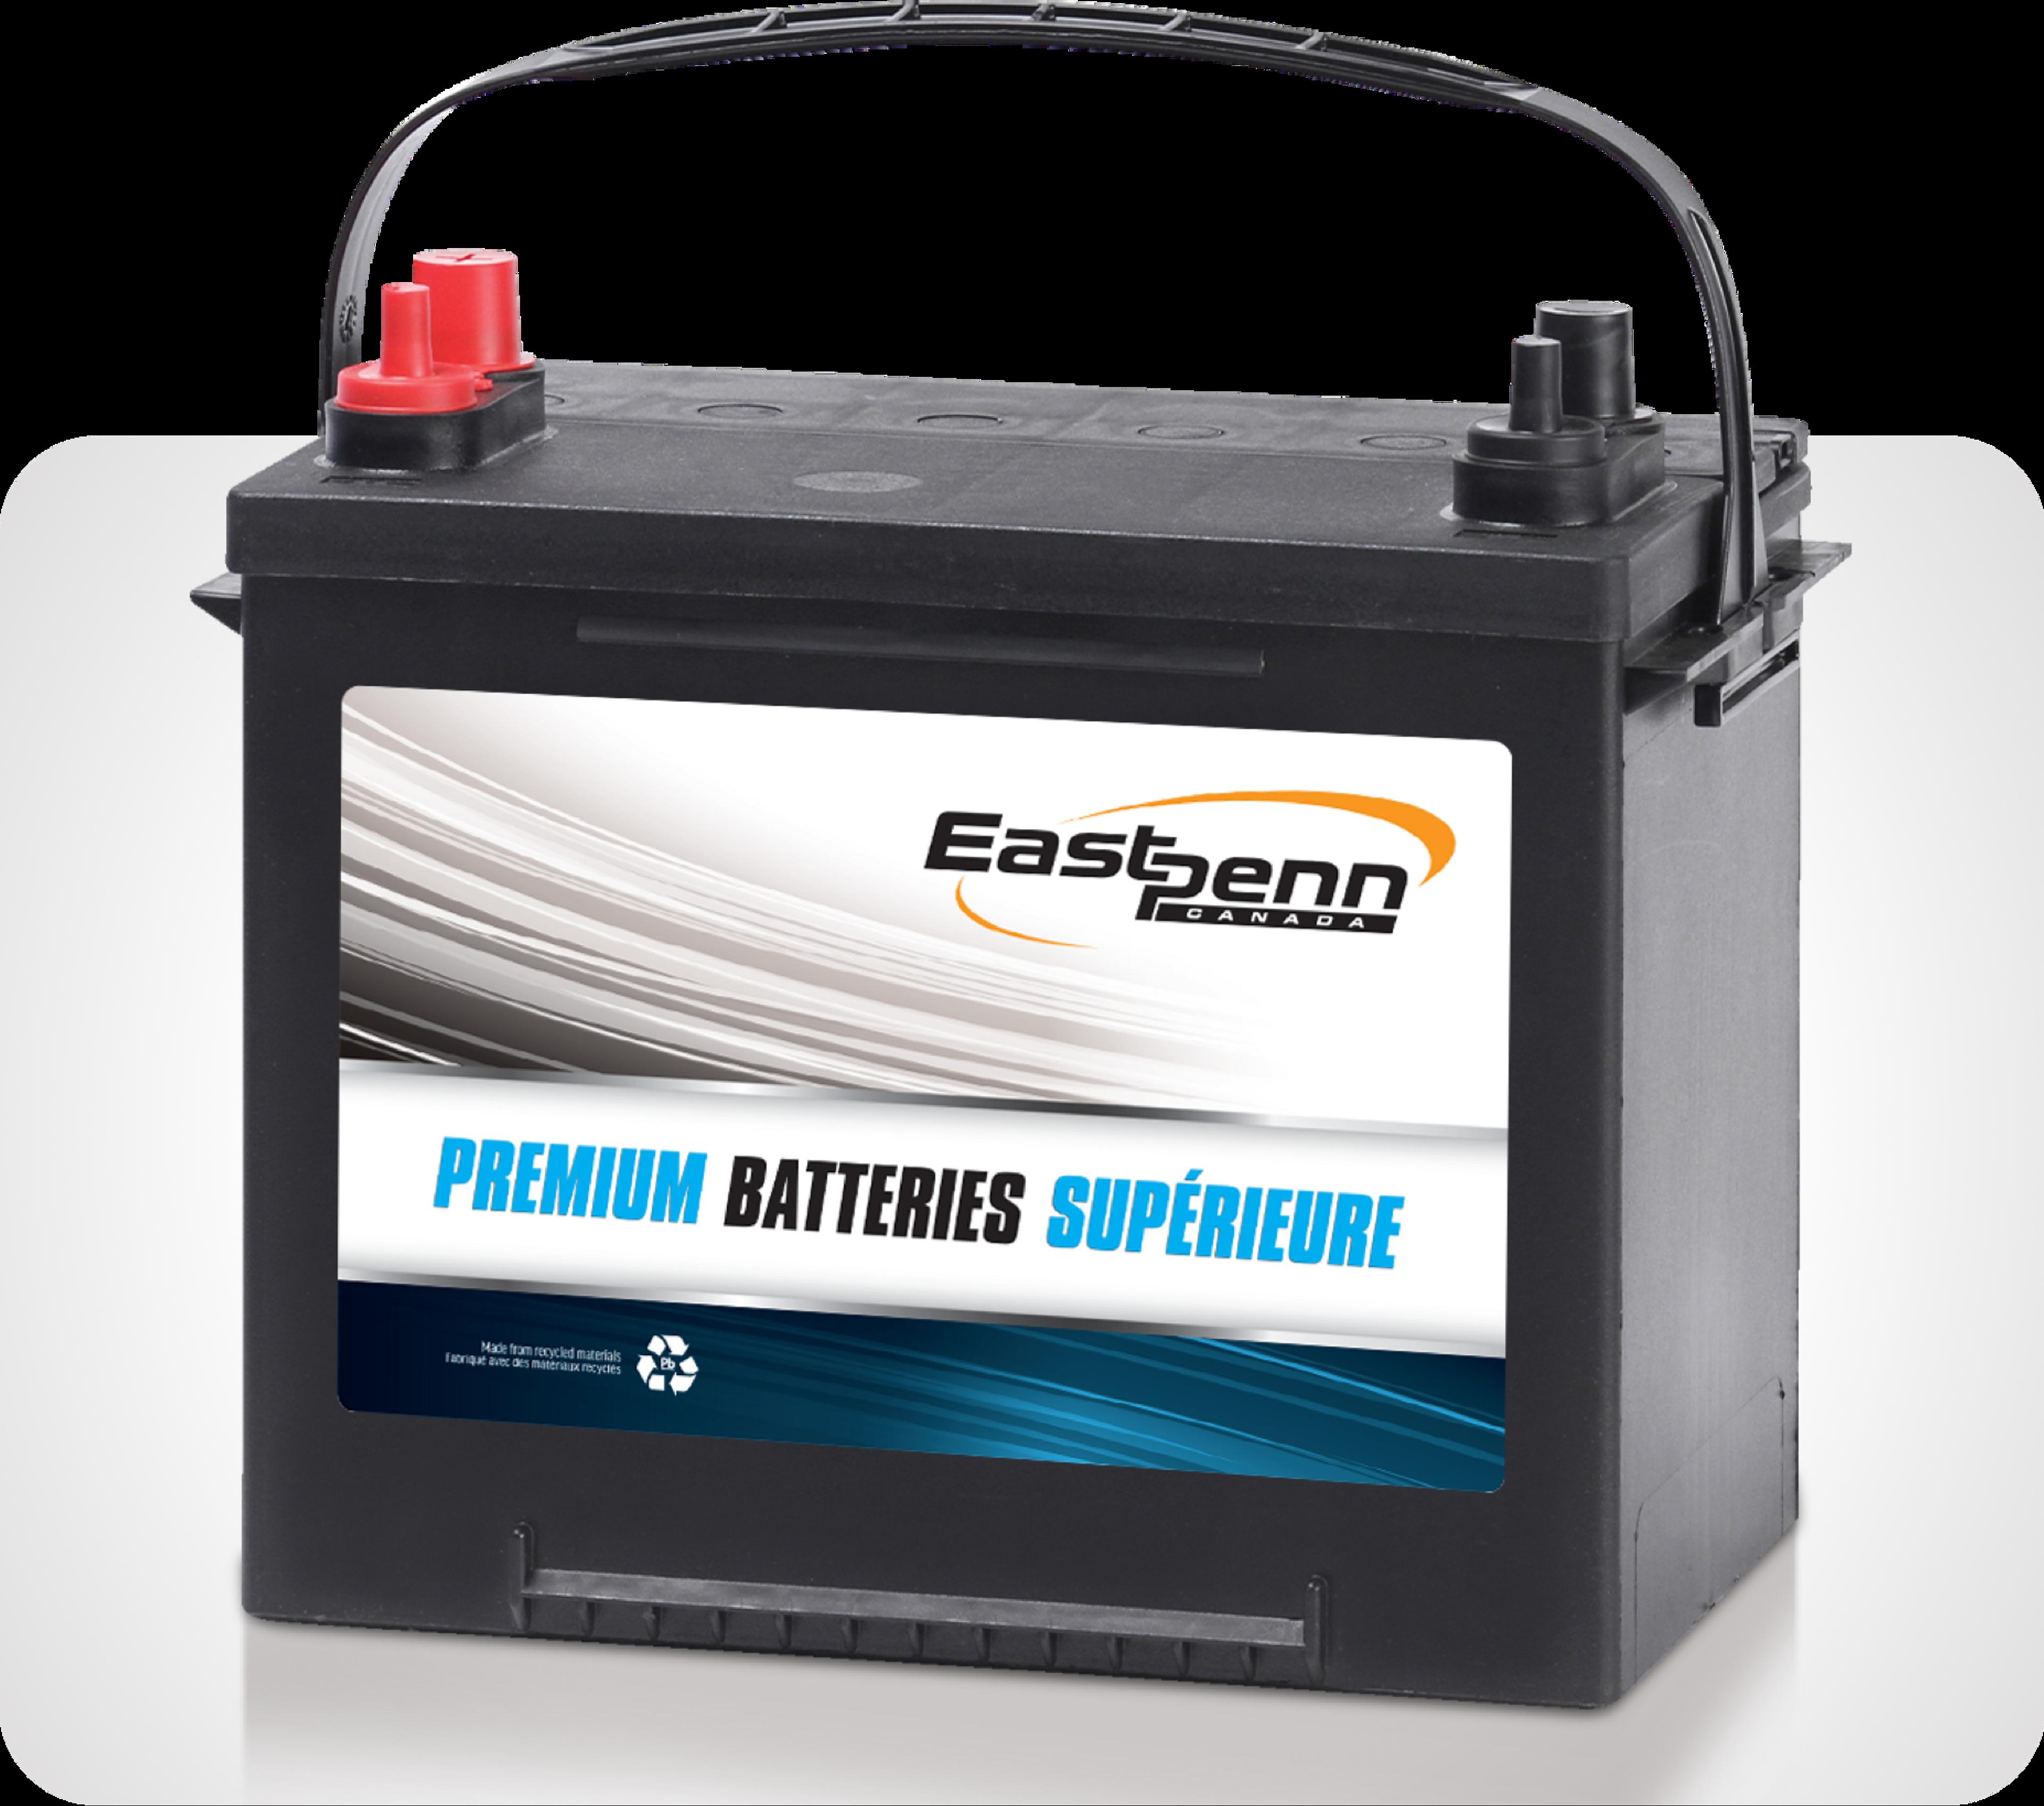 Picture of single East Penn brand premium car dual purpose batteries